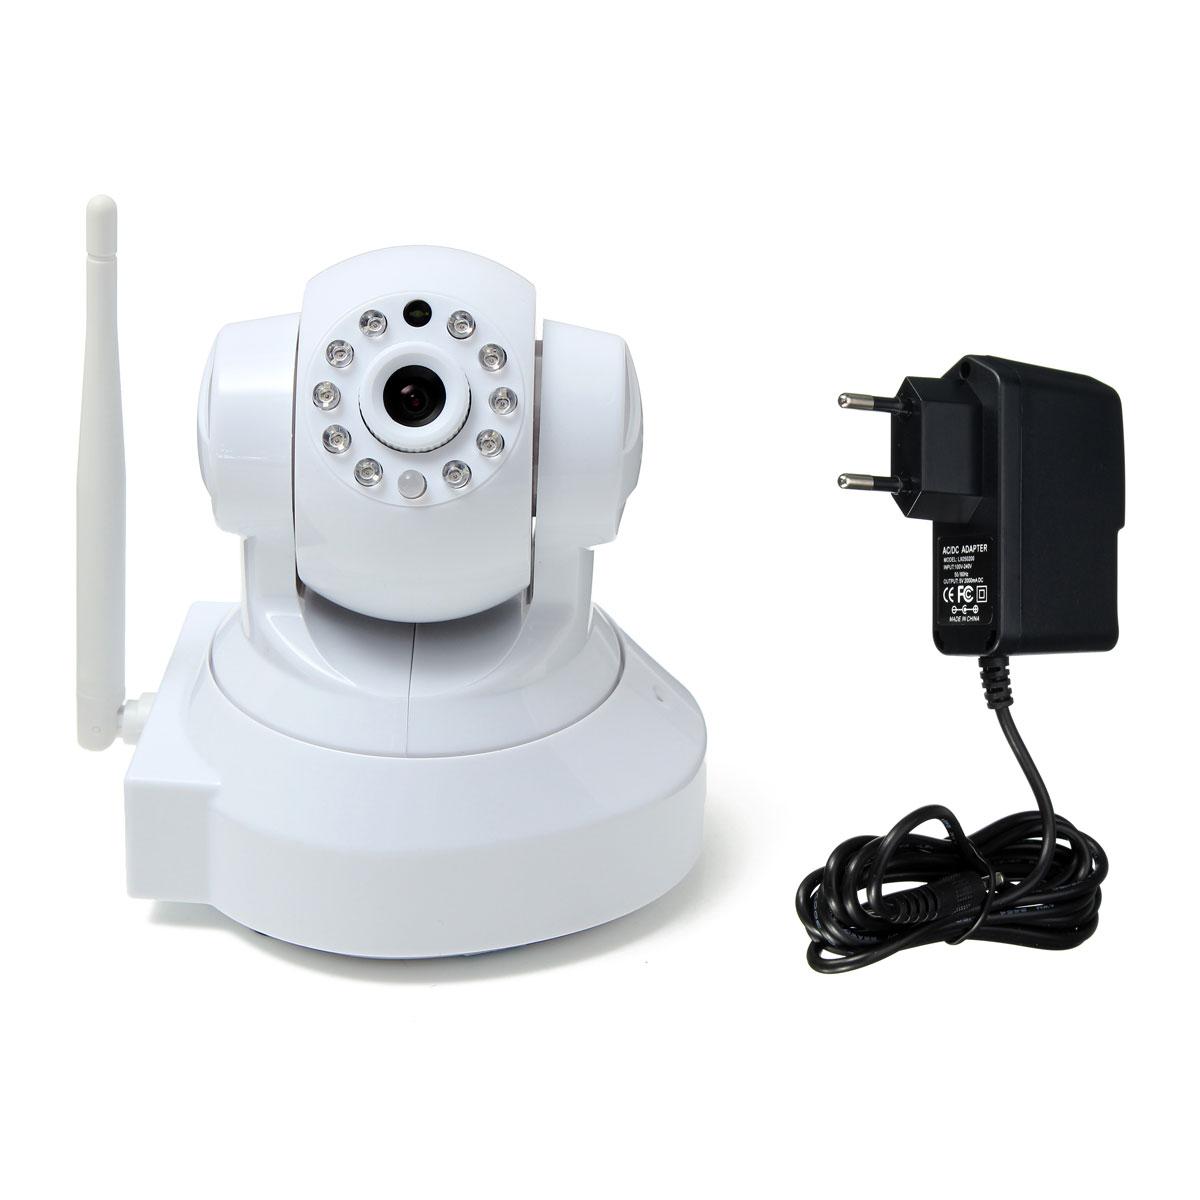 720p wifi wlan funk berwachungskamera cctv hd nachtsicht kamera netzwerkkamera. Black Bedroom Furniture Sets. Home Design Ideas